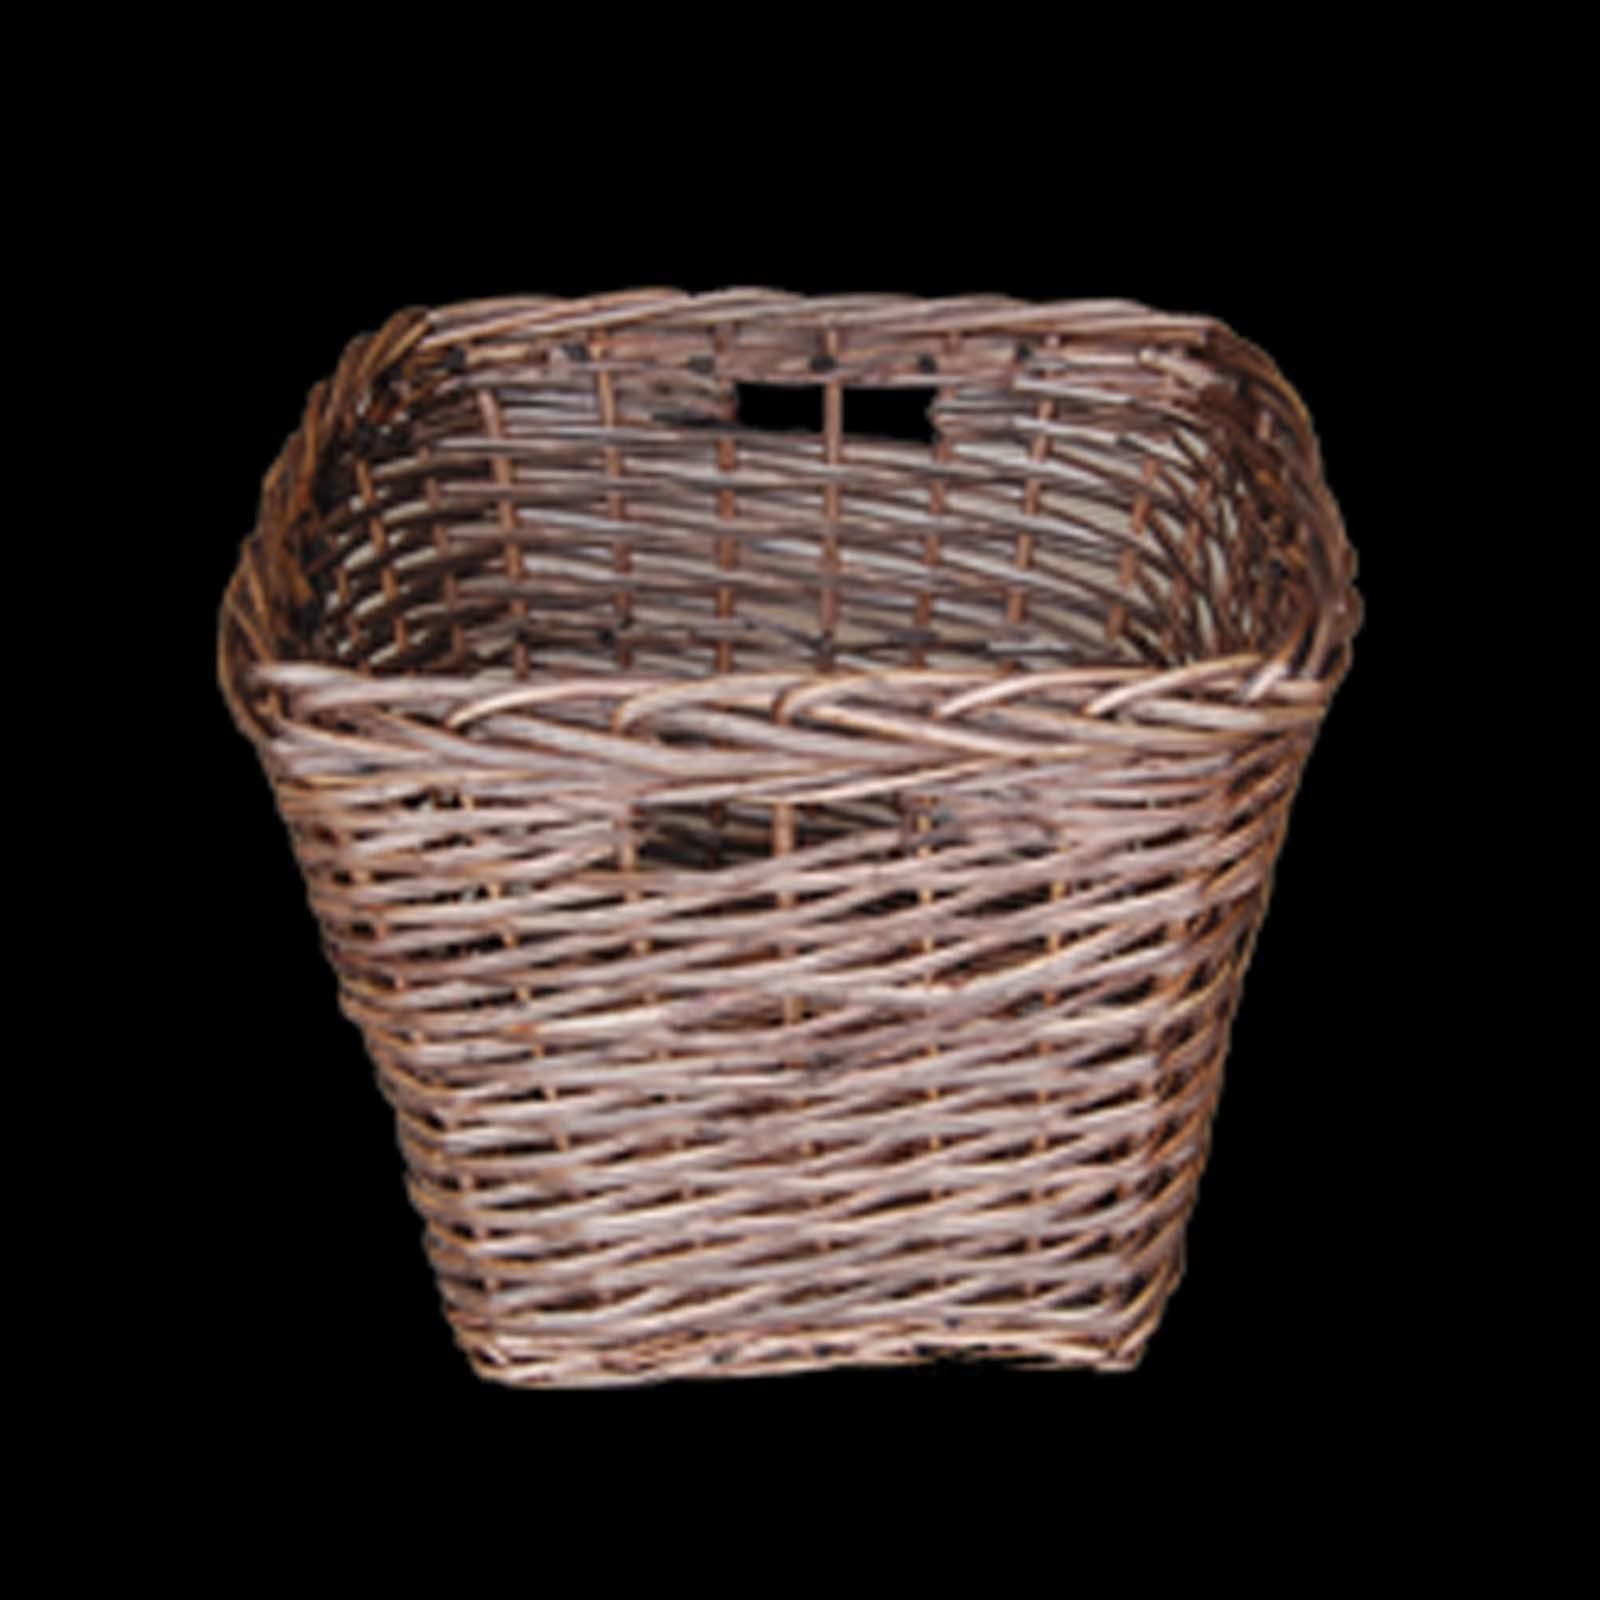 Big Savings Gallery Tytherton Log Basket Incredible Value